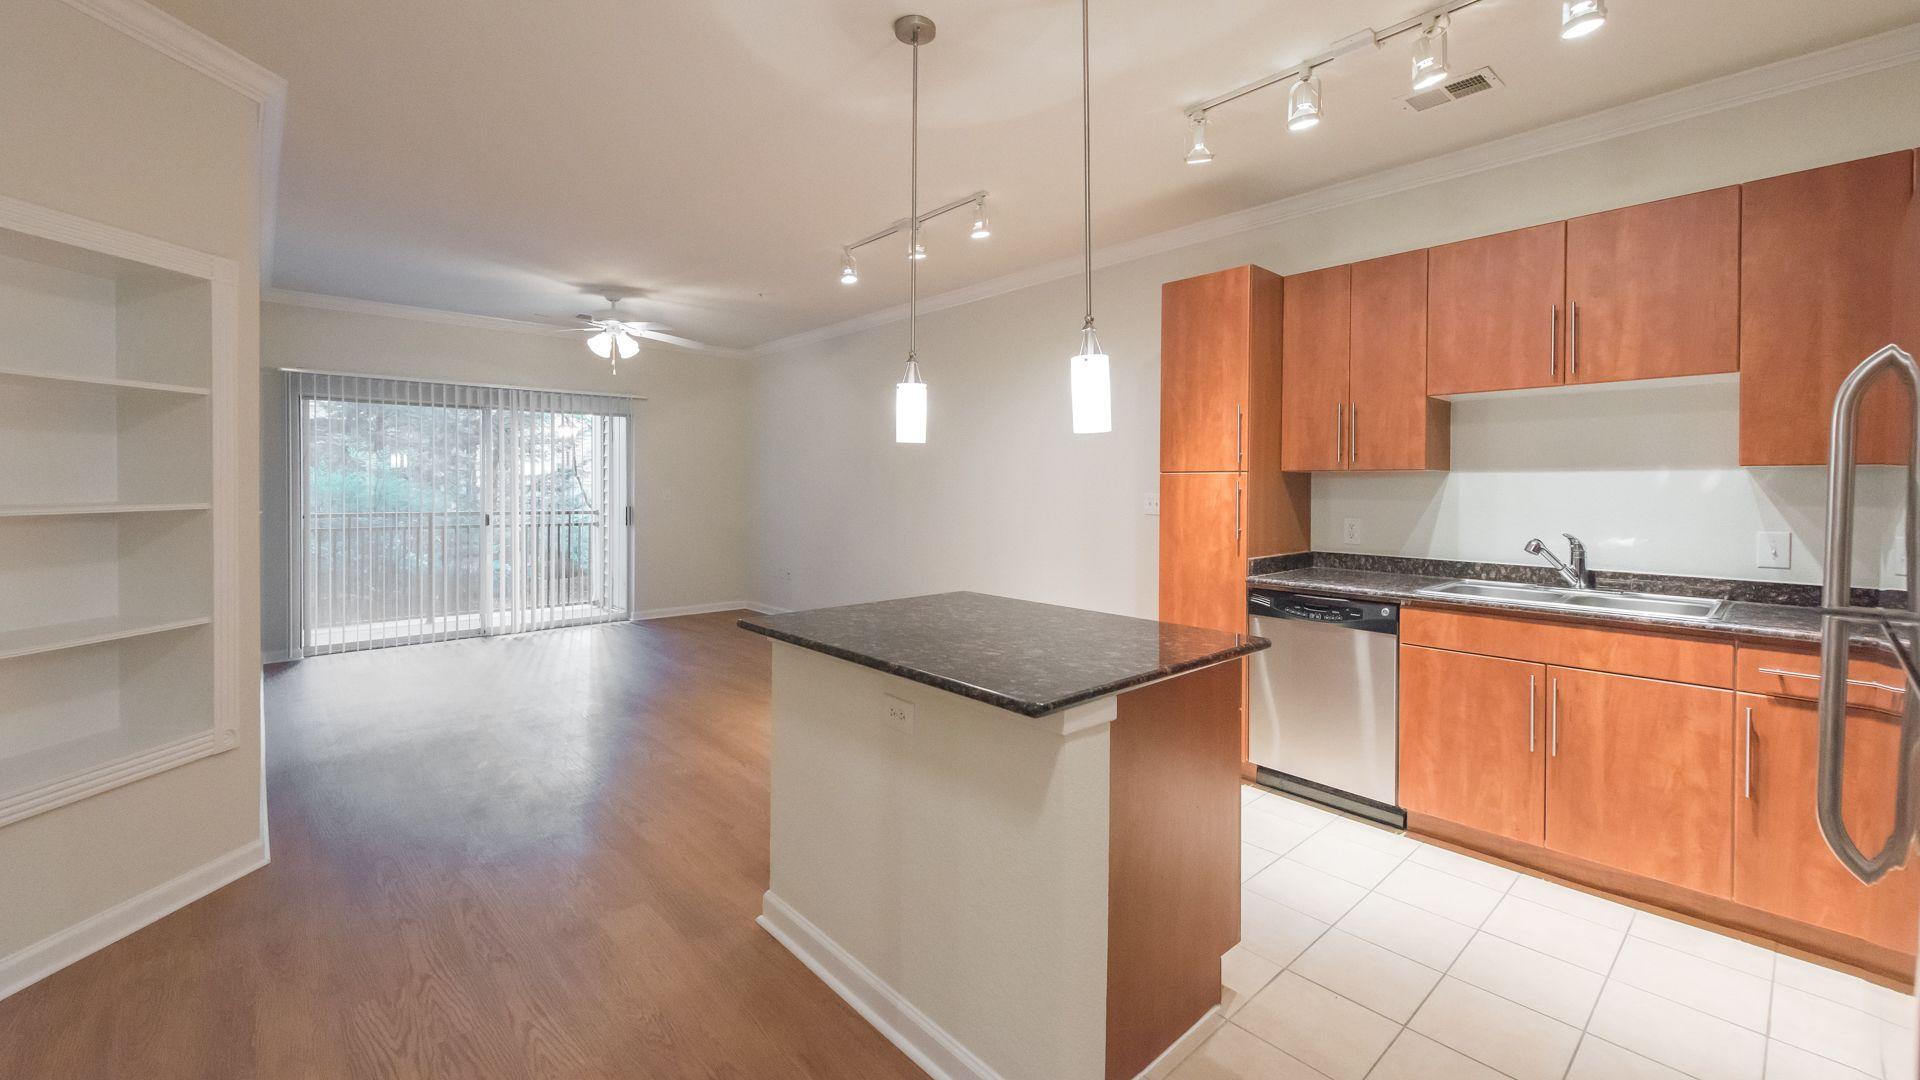 Fairchase Apartments - Kitchen